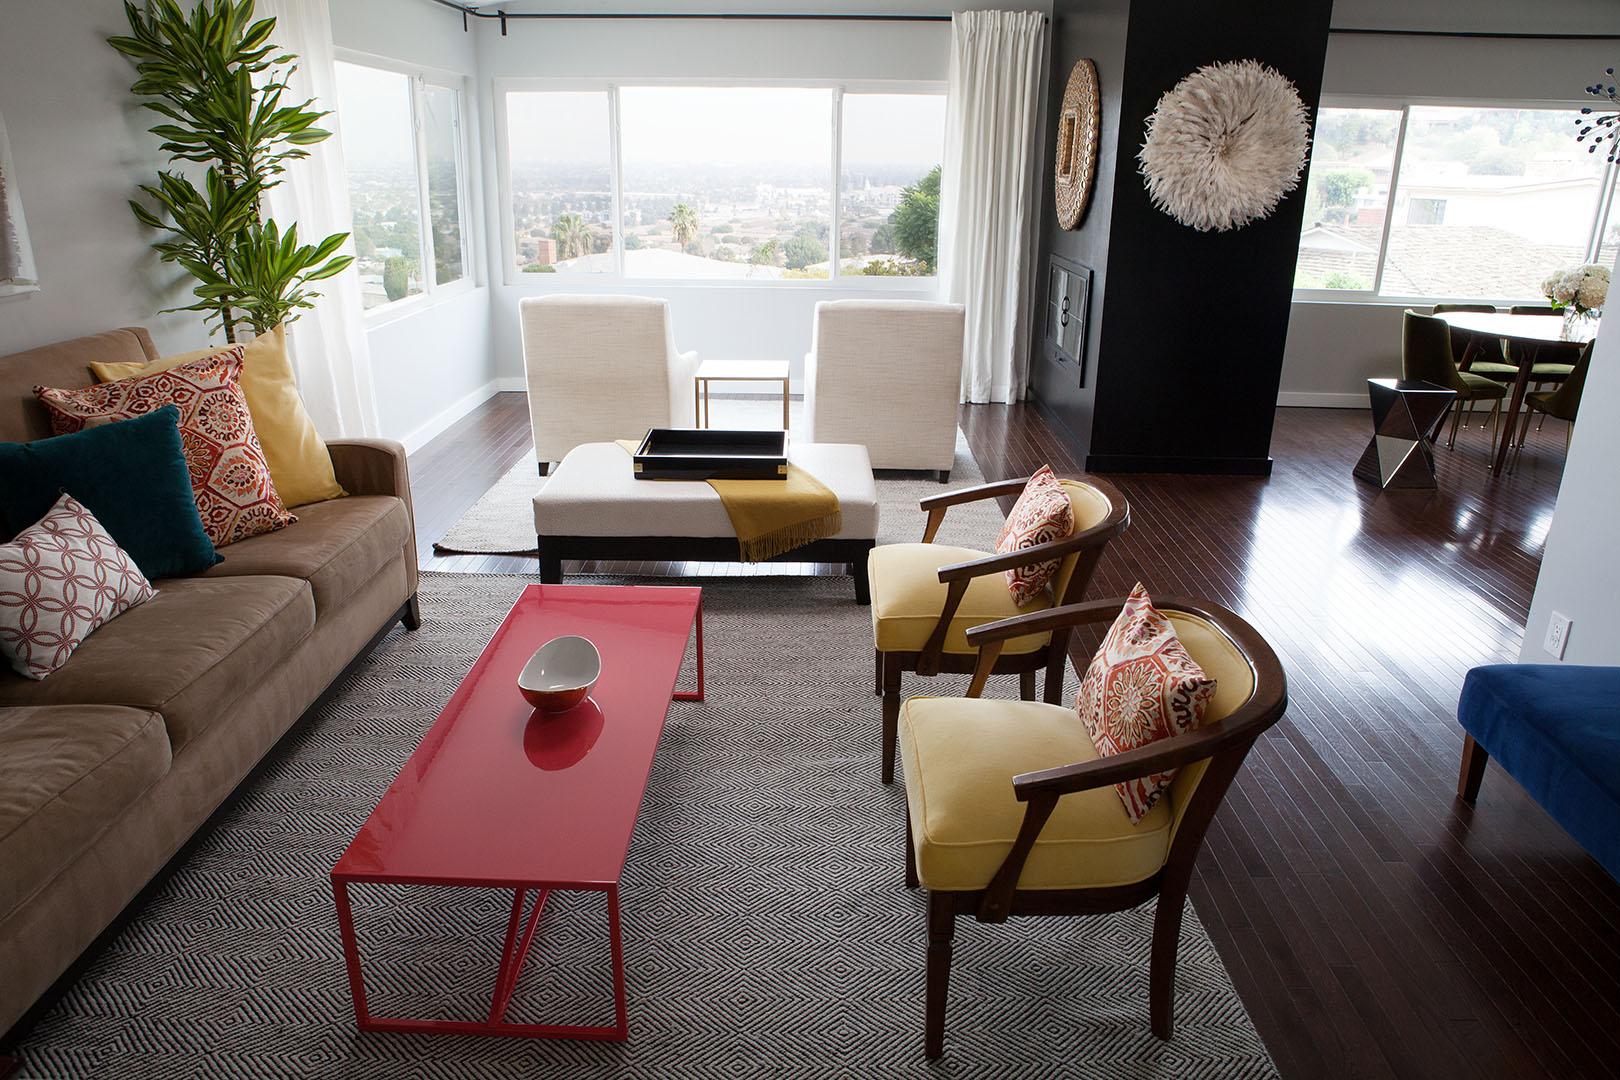 Living room furniture design in Oakland, CA